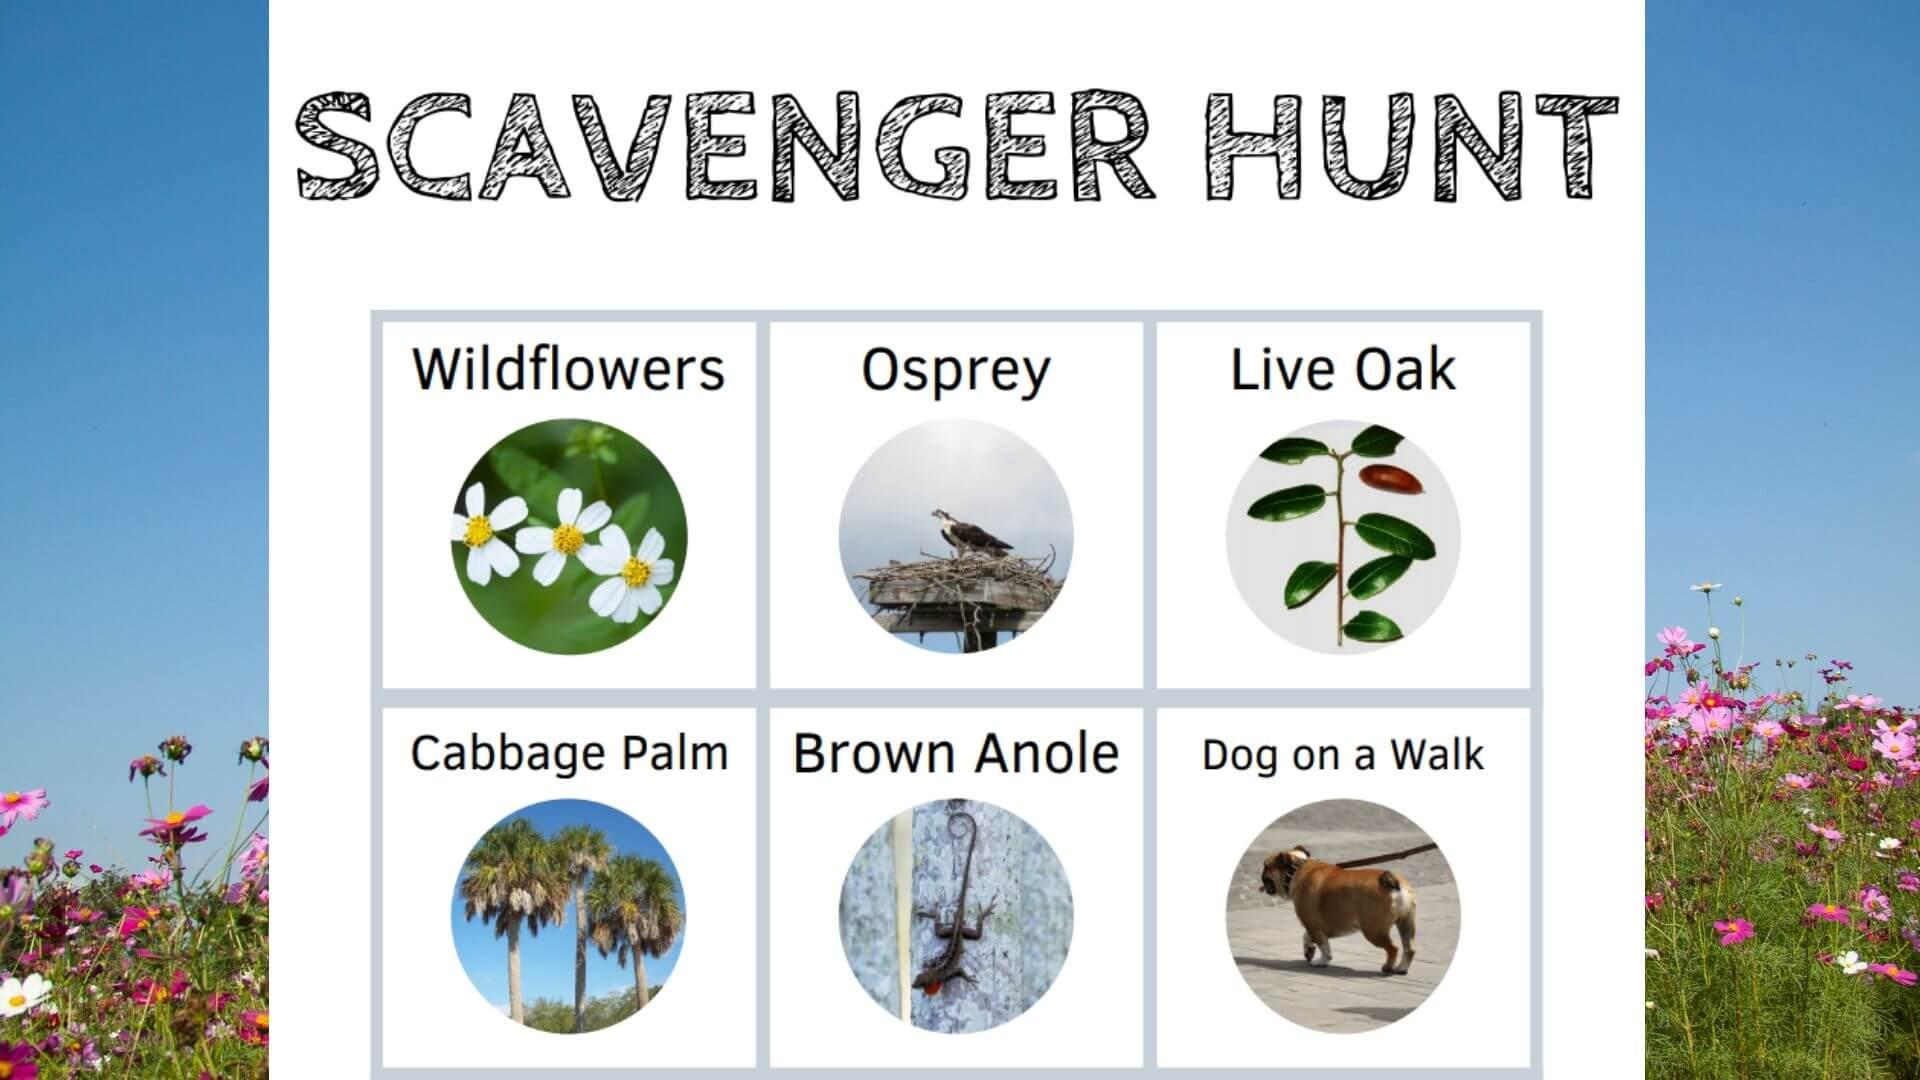 orlando science center outdoor scavenger hunt